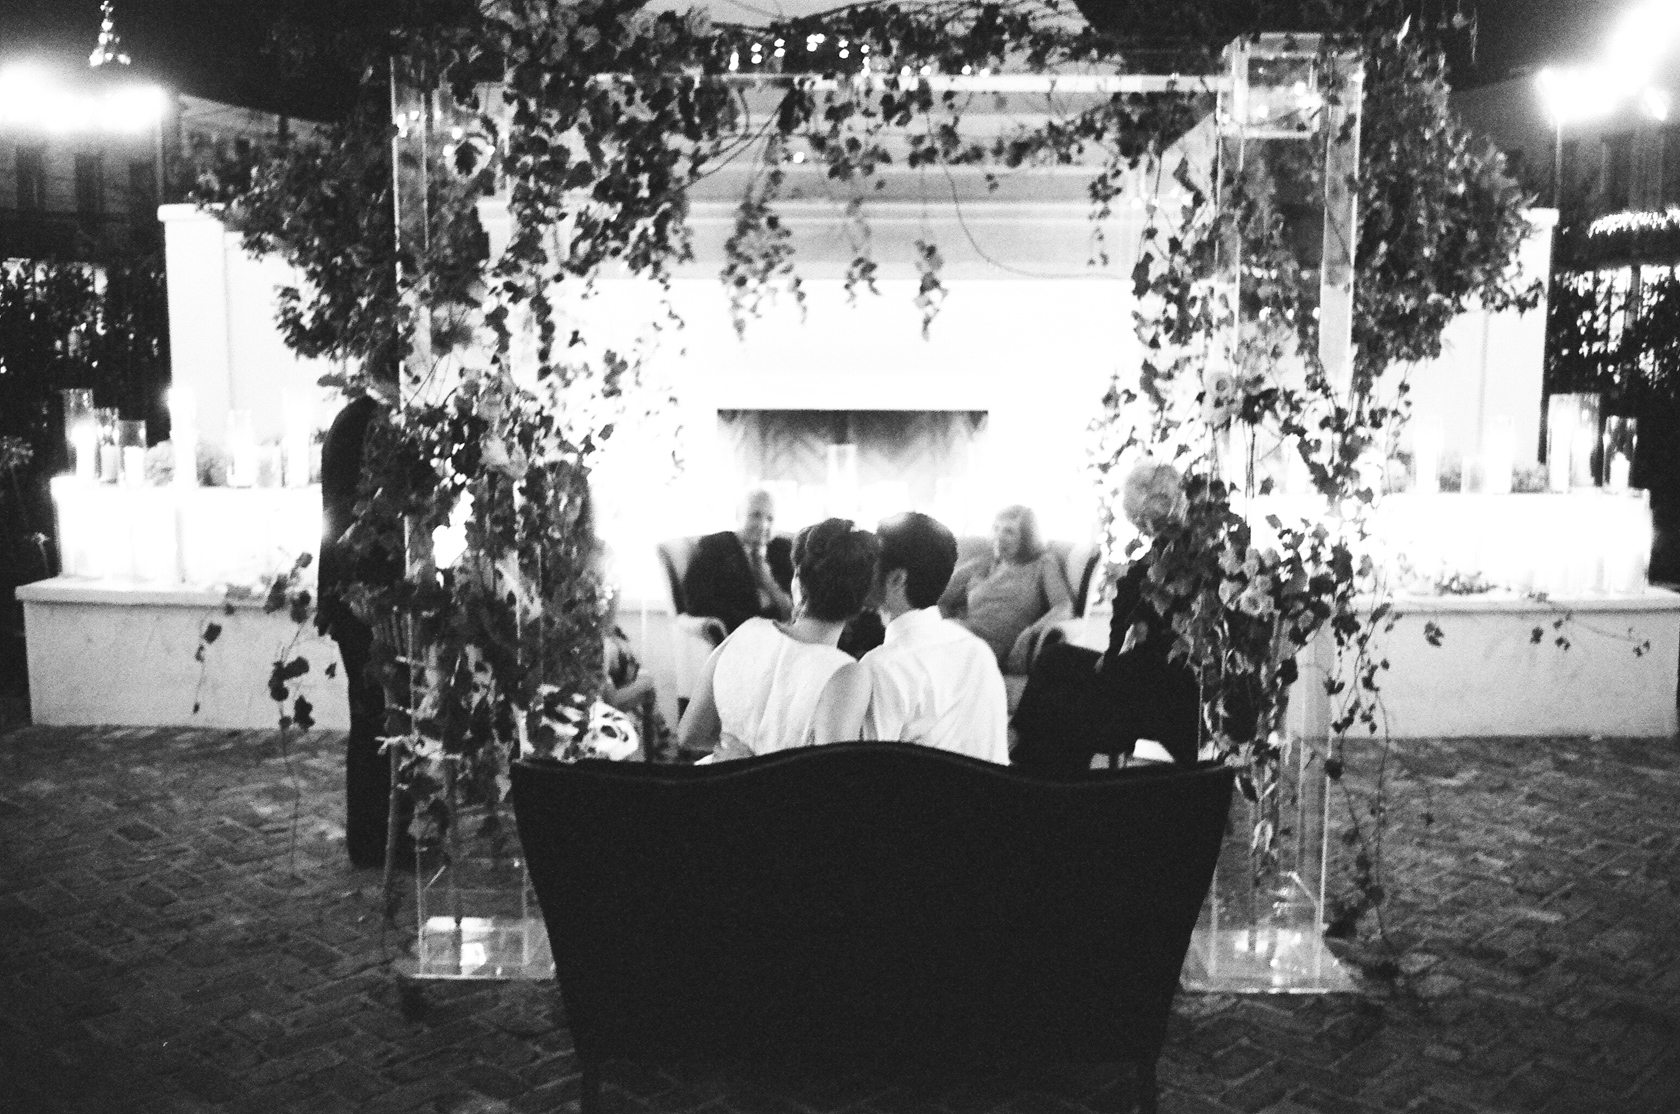 new orleans il mercato wedding reception on film 02